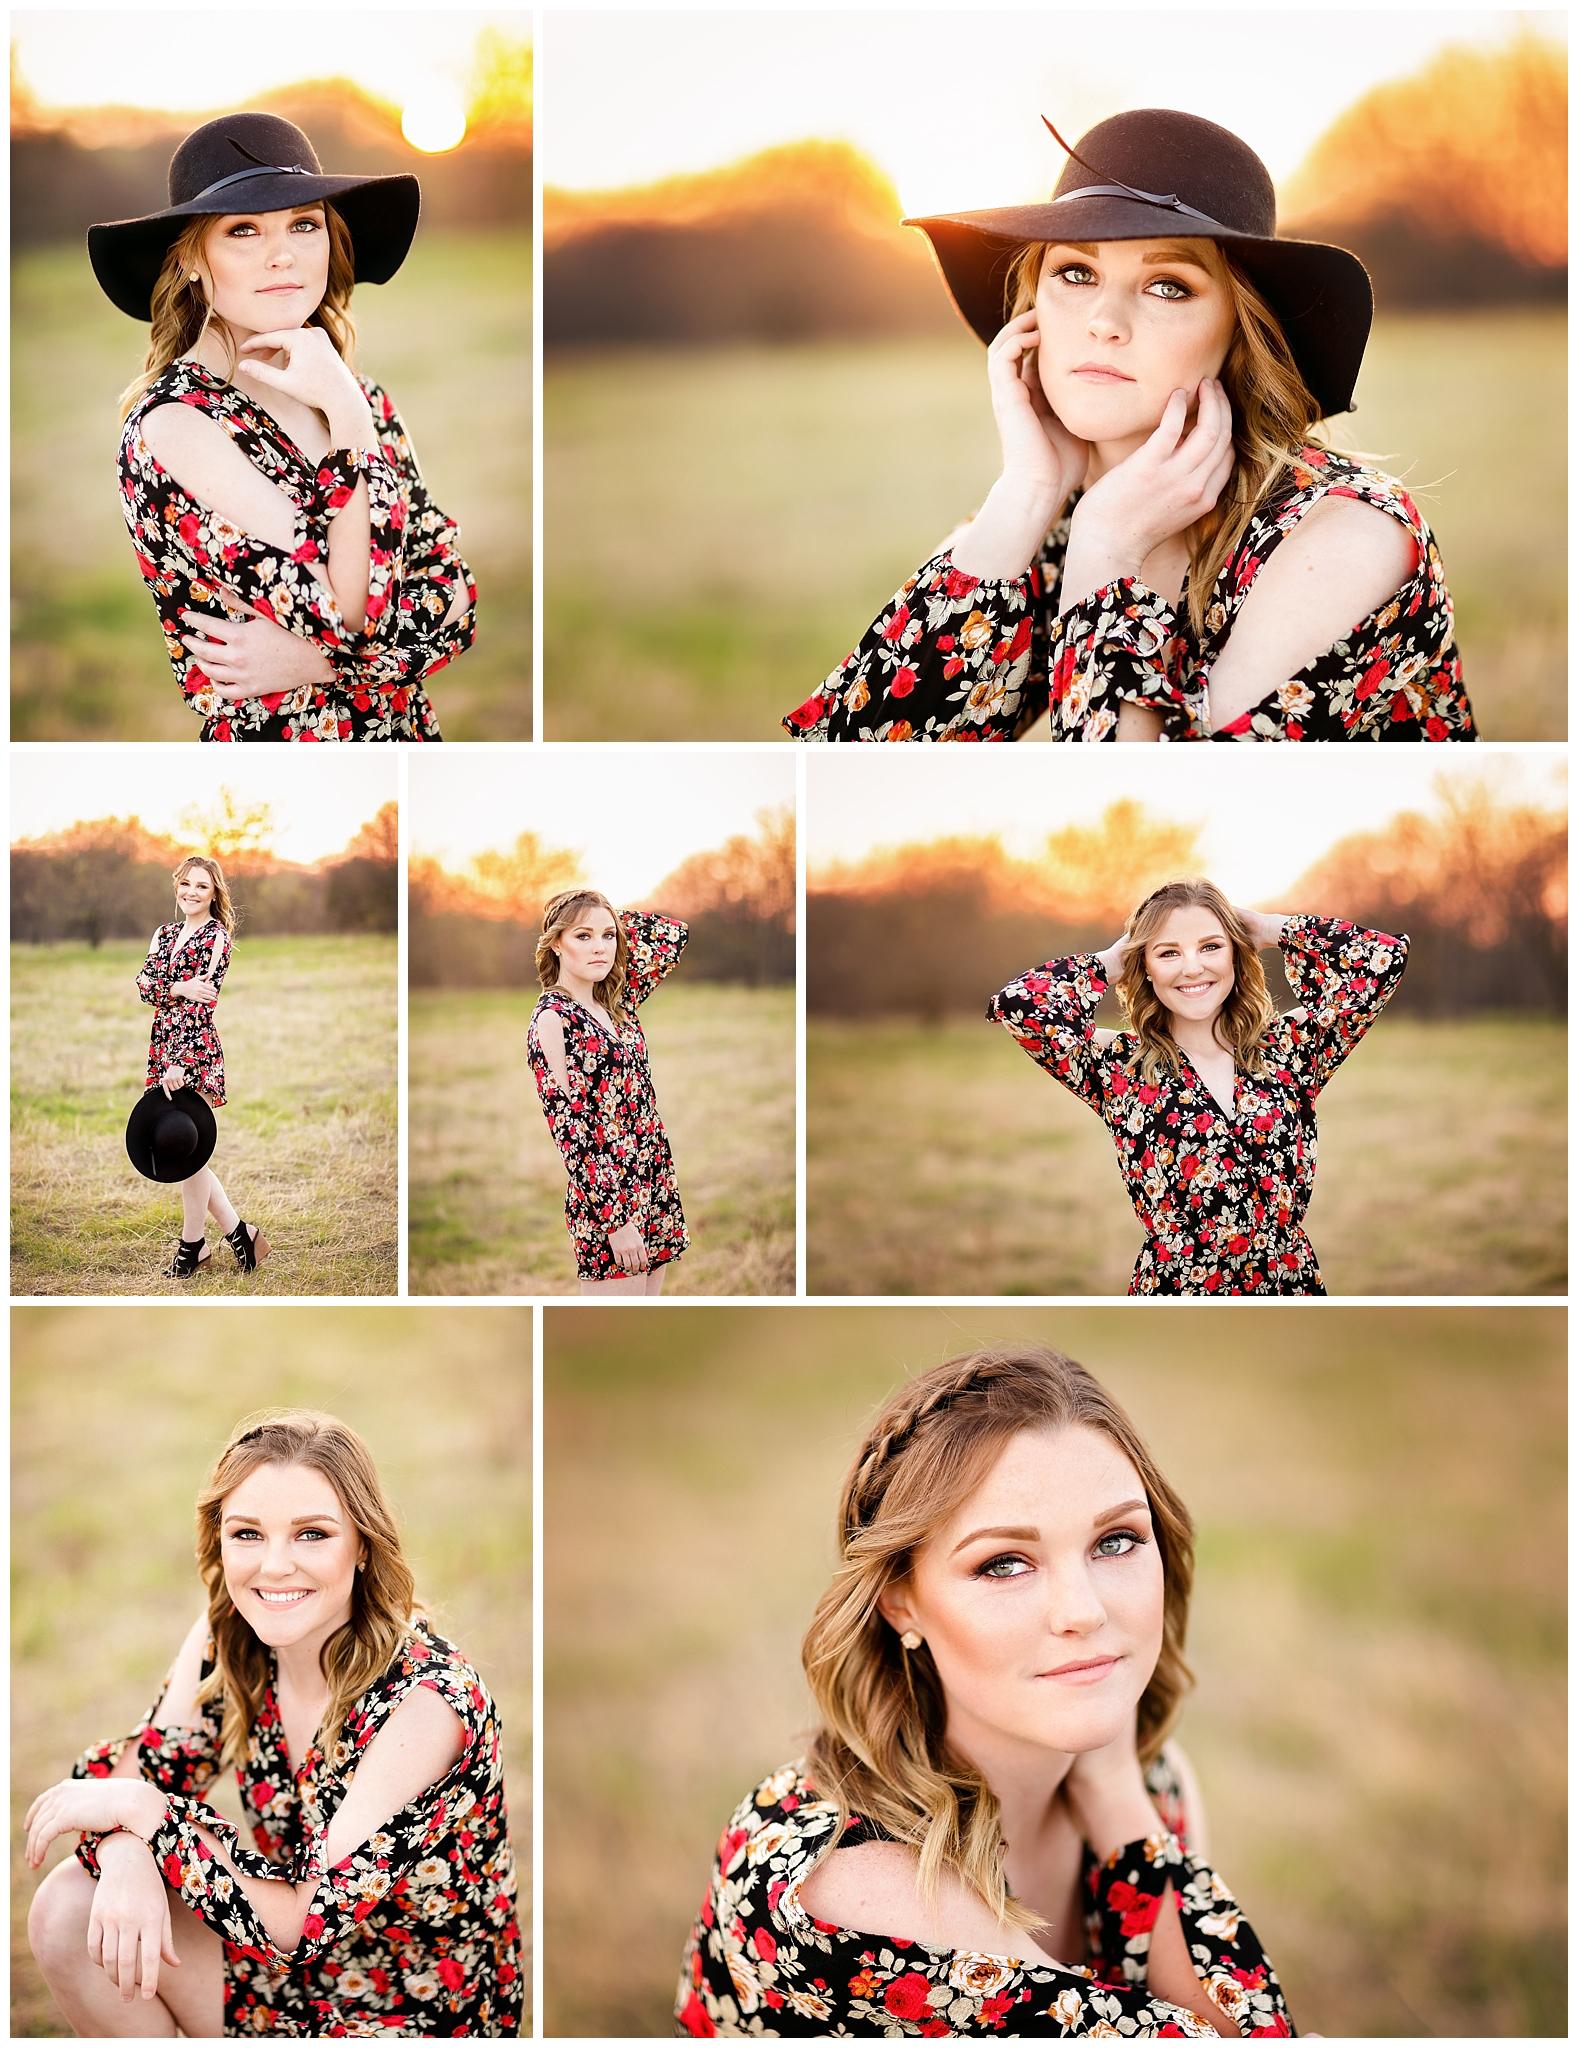 kylee-swisher-photography-senior-photographer-texas-tx